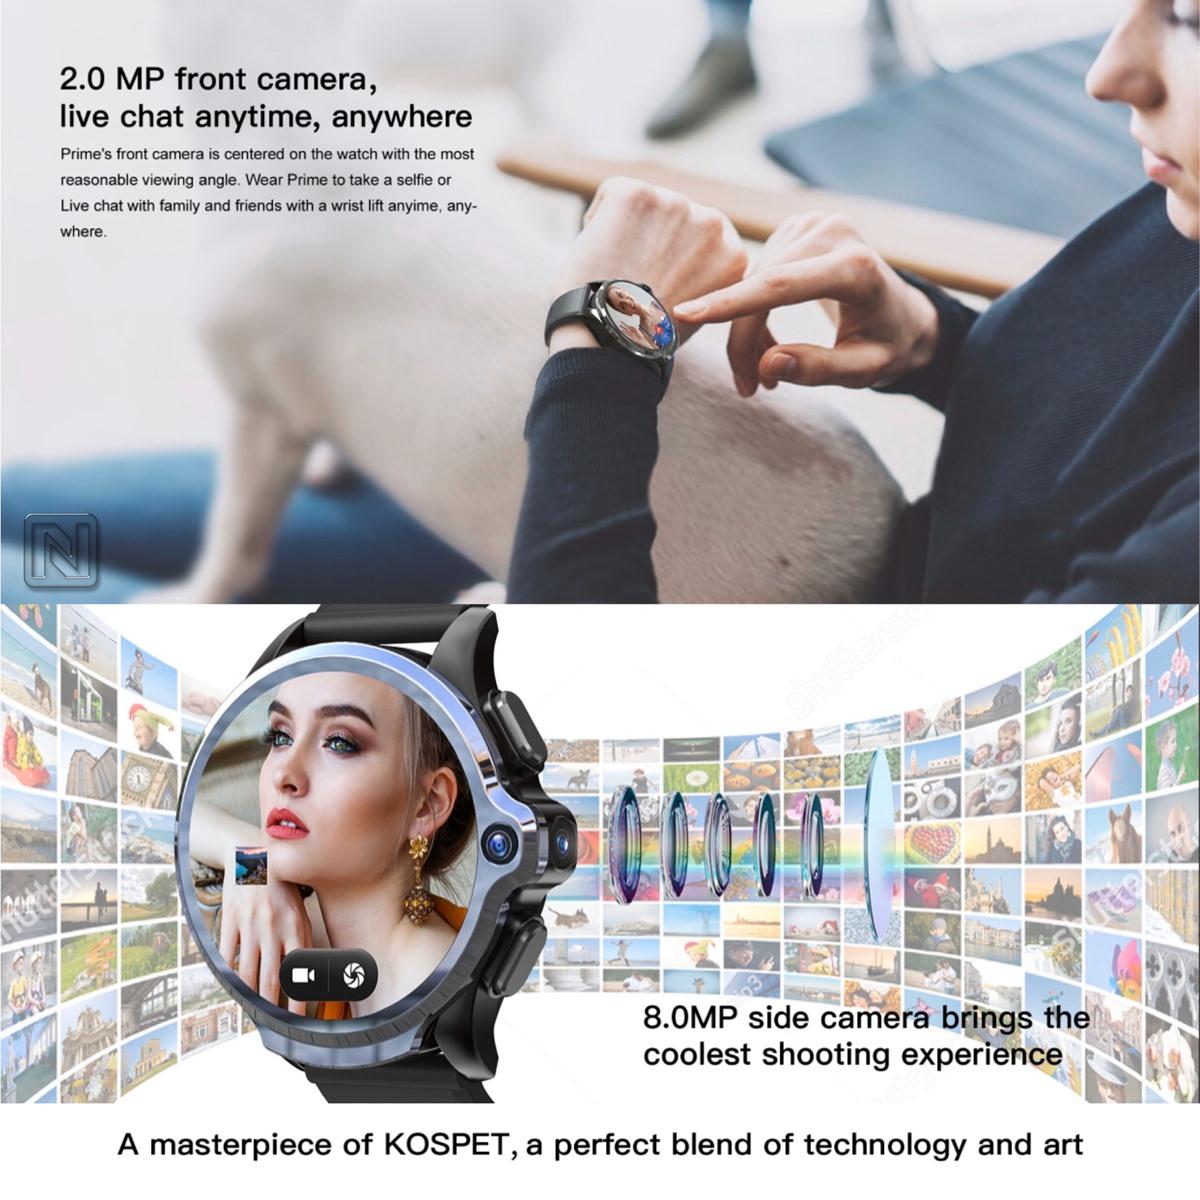 "Kospet Prime 1.6"" 'Yüz Tanıma 1260 mAh Batarya 3G + 32G Çift Kamera 4G LTE"